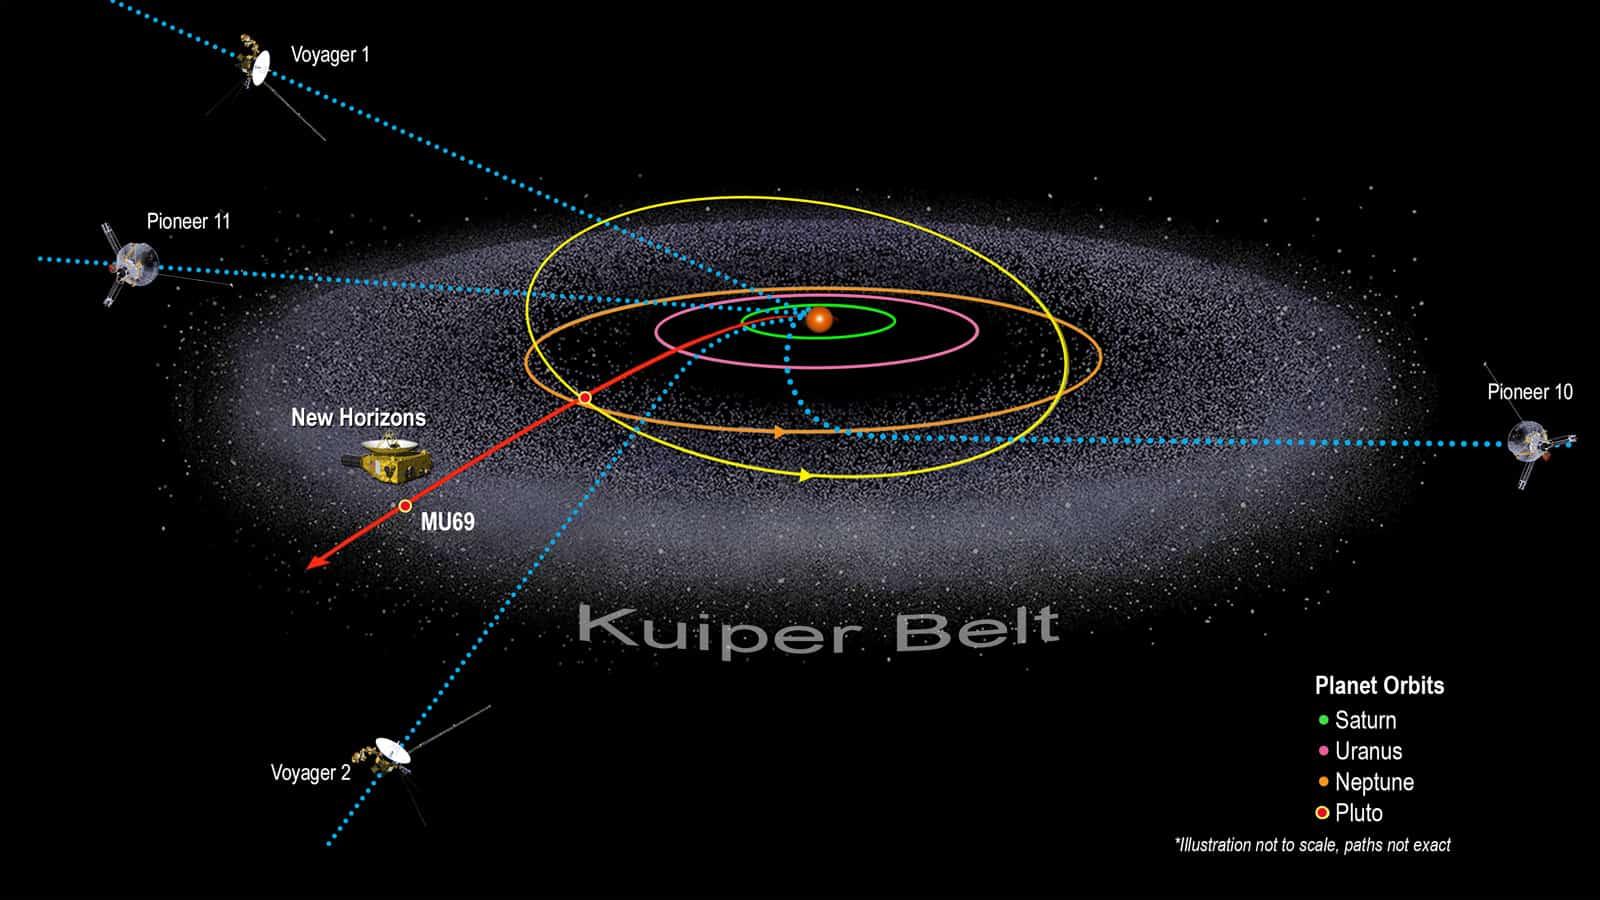 Kuiper Belt Facts #1: One of many Kuiper Belts